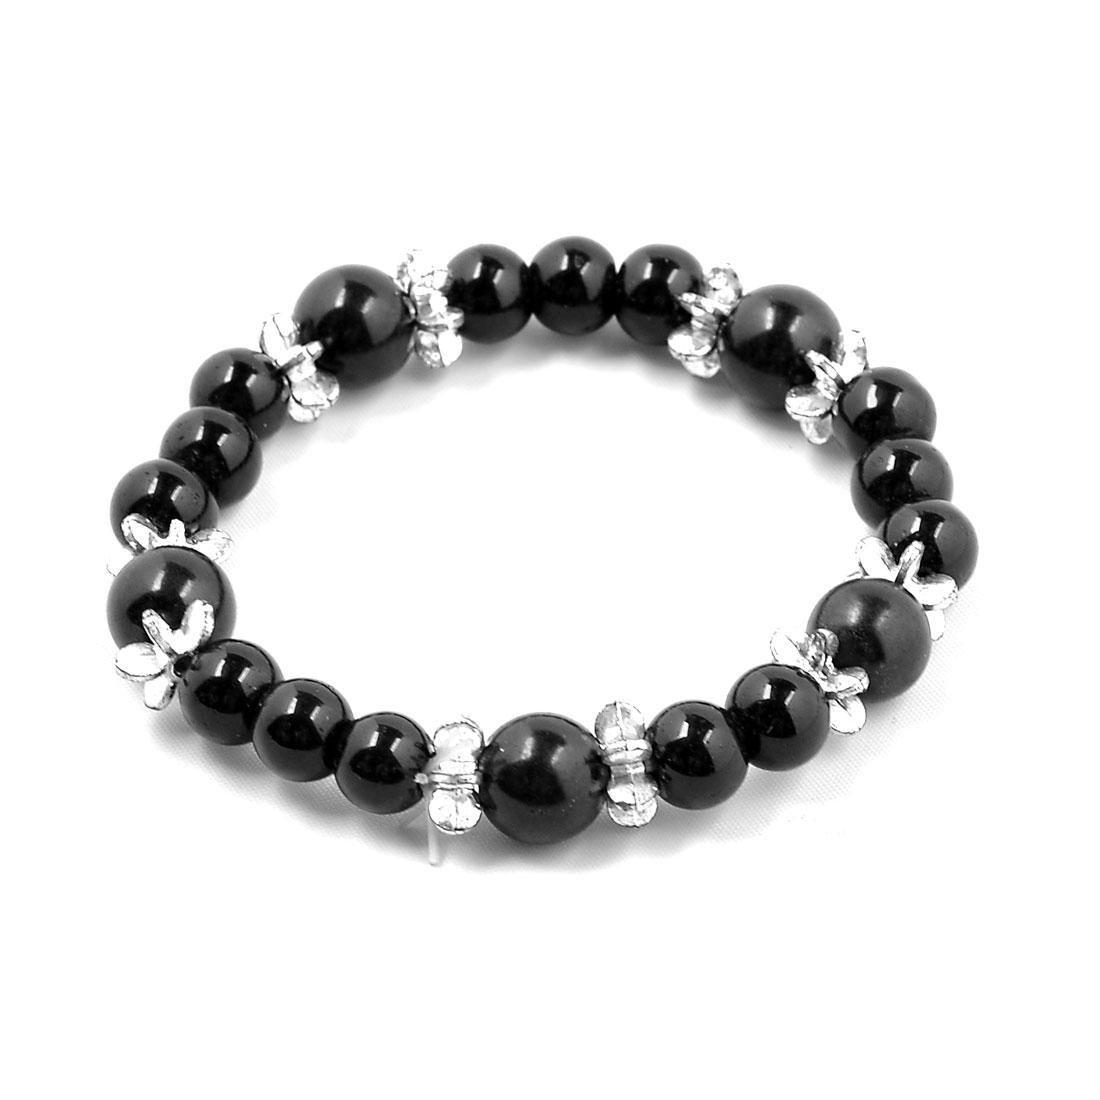 Black Grass Beads Silver Tone Flower Shape Elastic Bracelet Bangle for Ladies